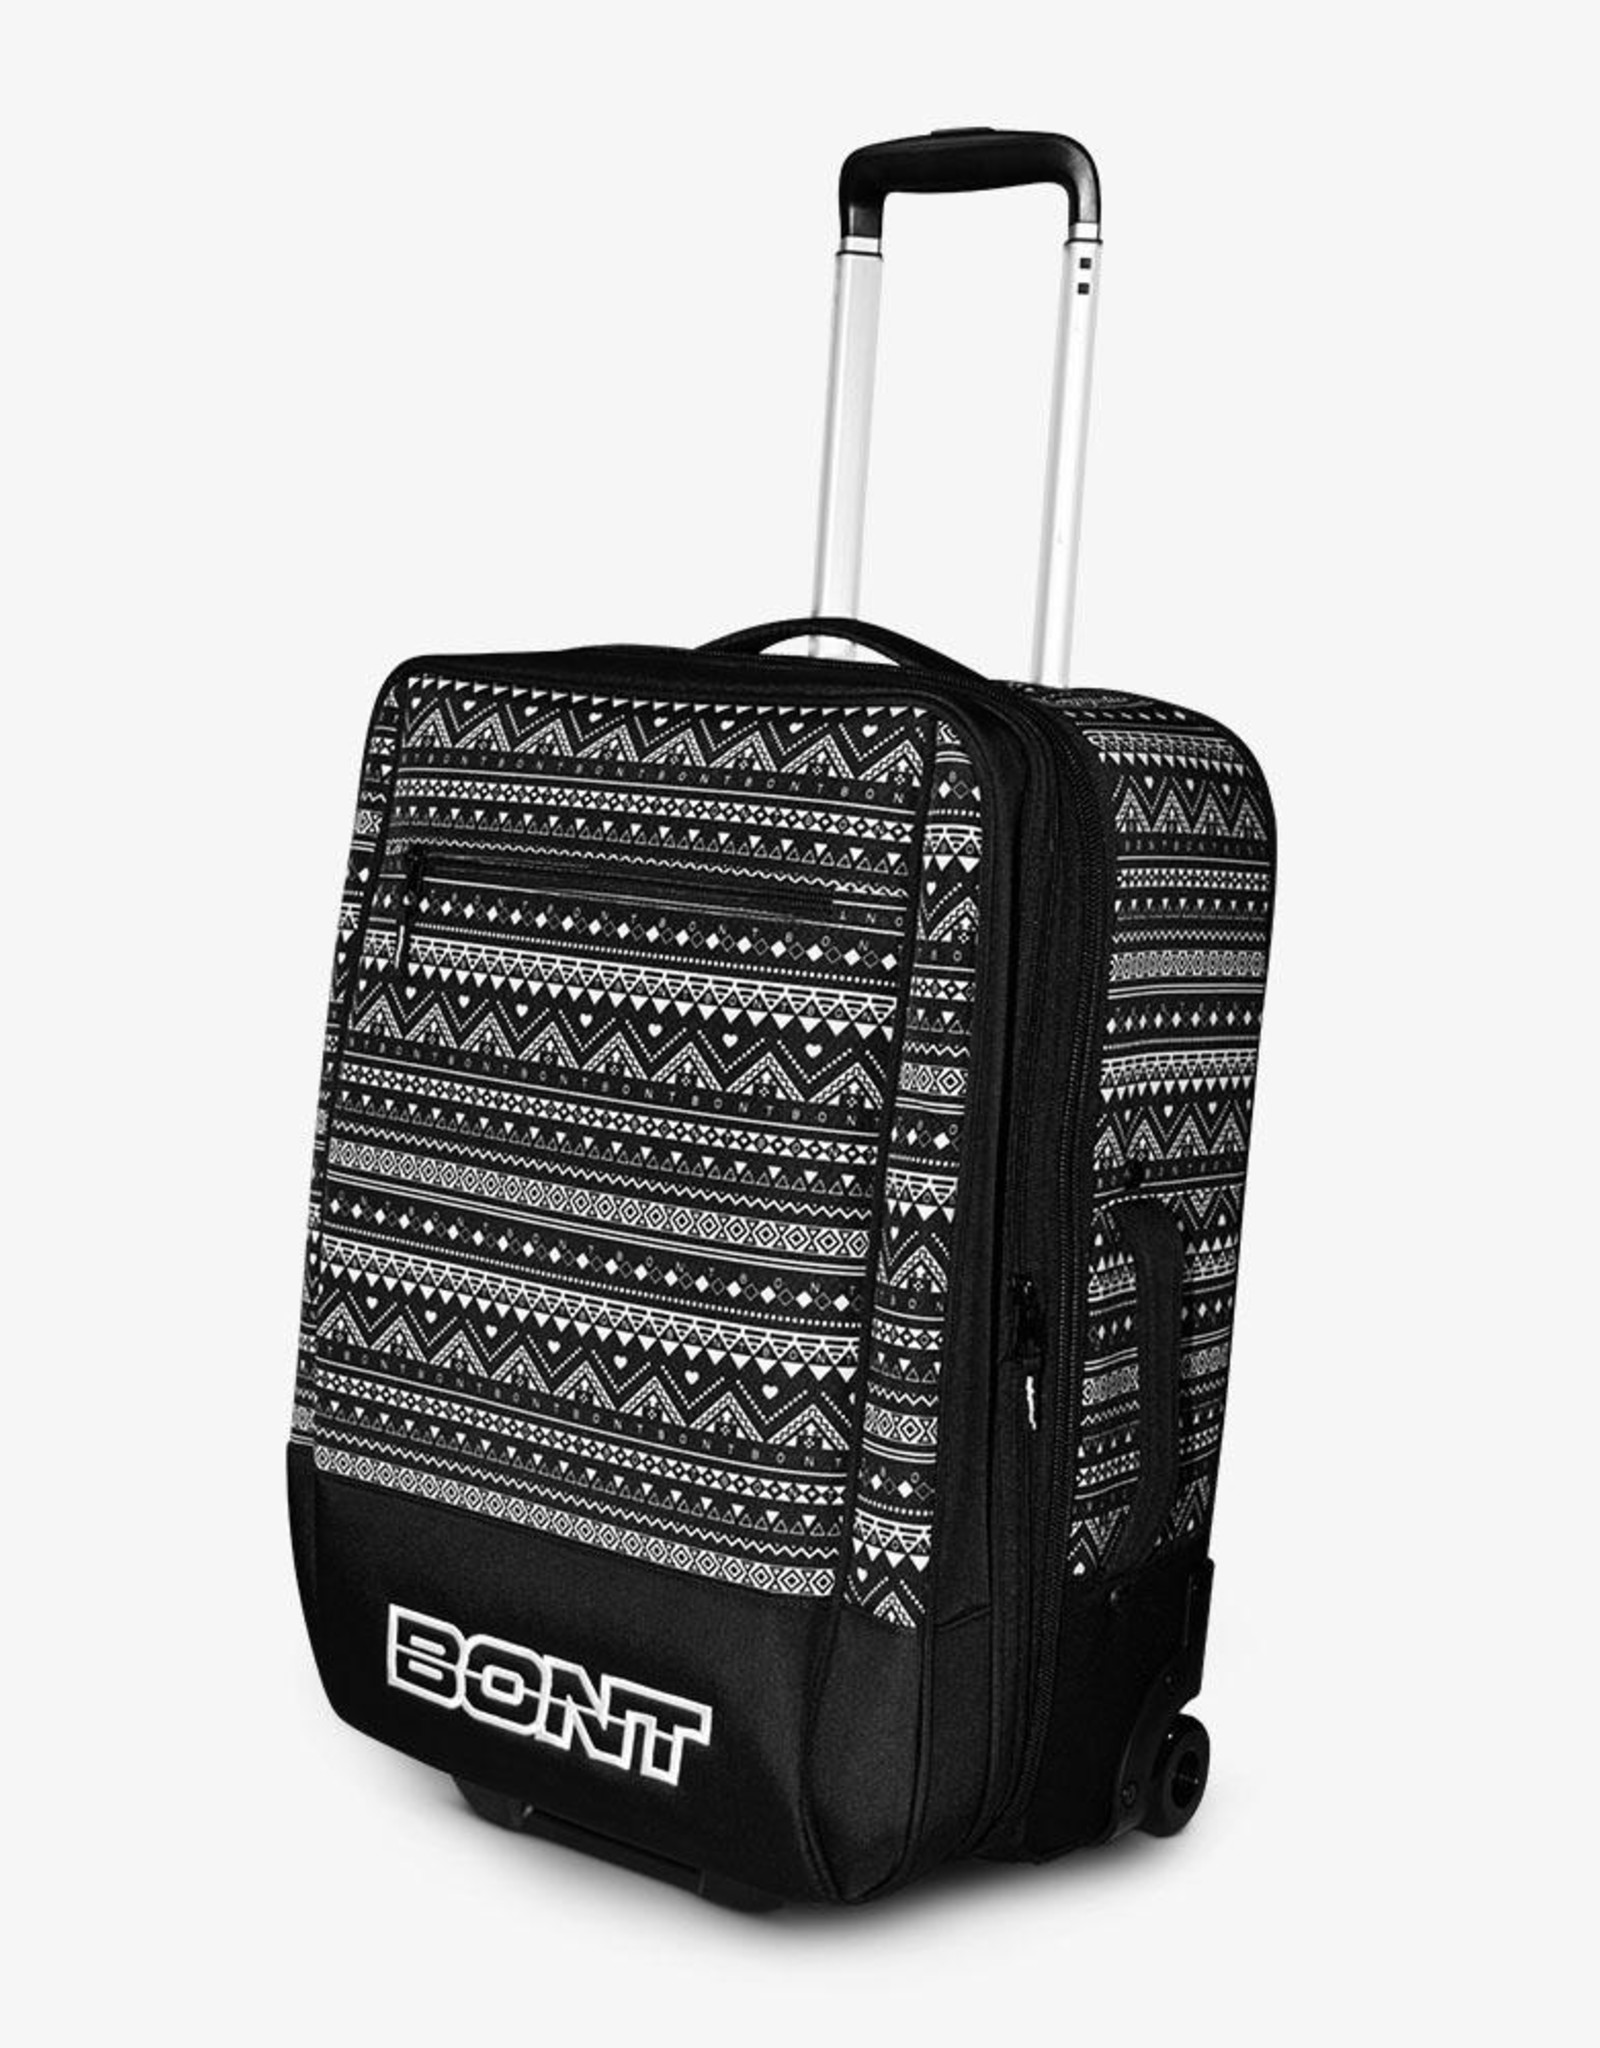 Bont Bont Wheelie Bag